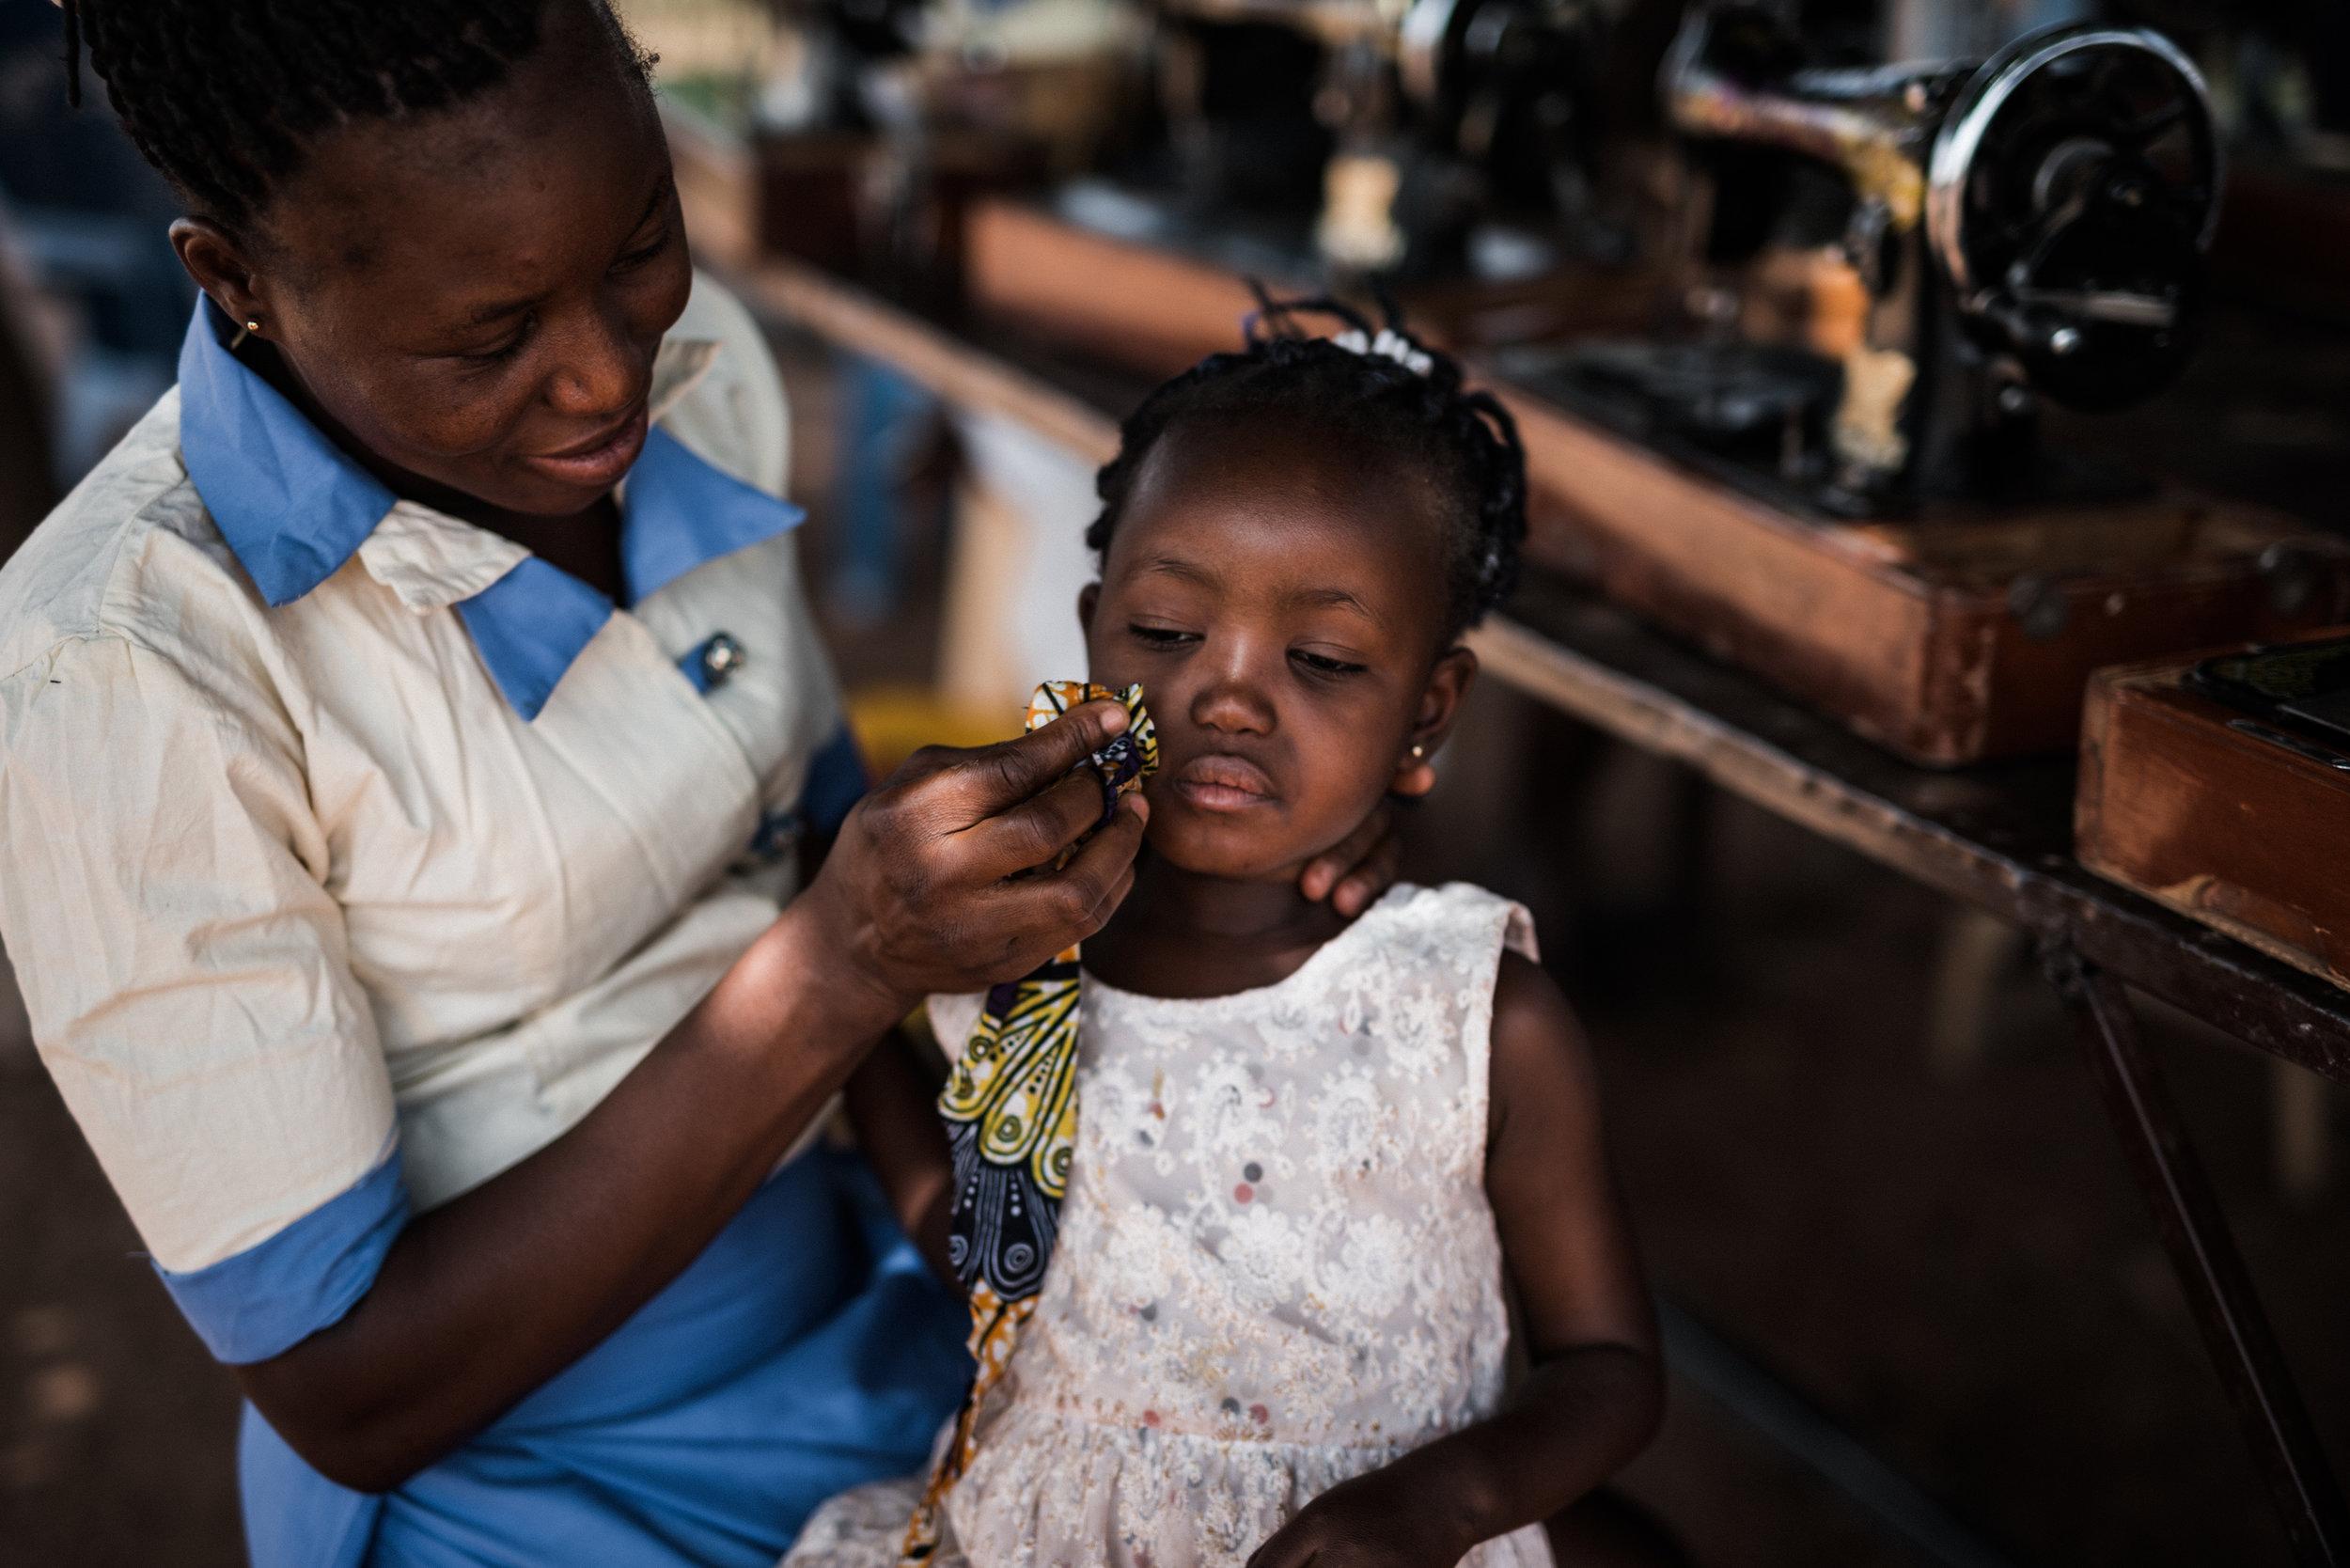 TaraShupe_HumanitarianPhotographer_Woman_Photographer_National_Geographic_Ghana_Women_004.jpg